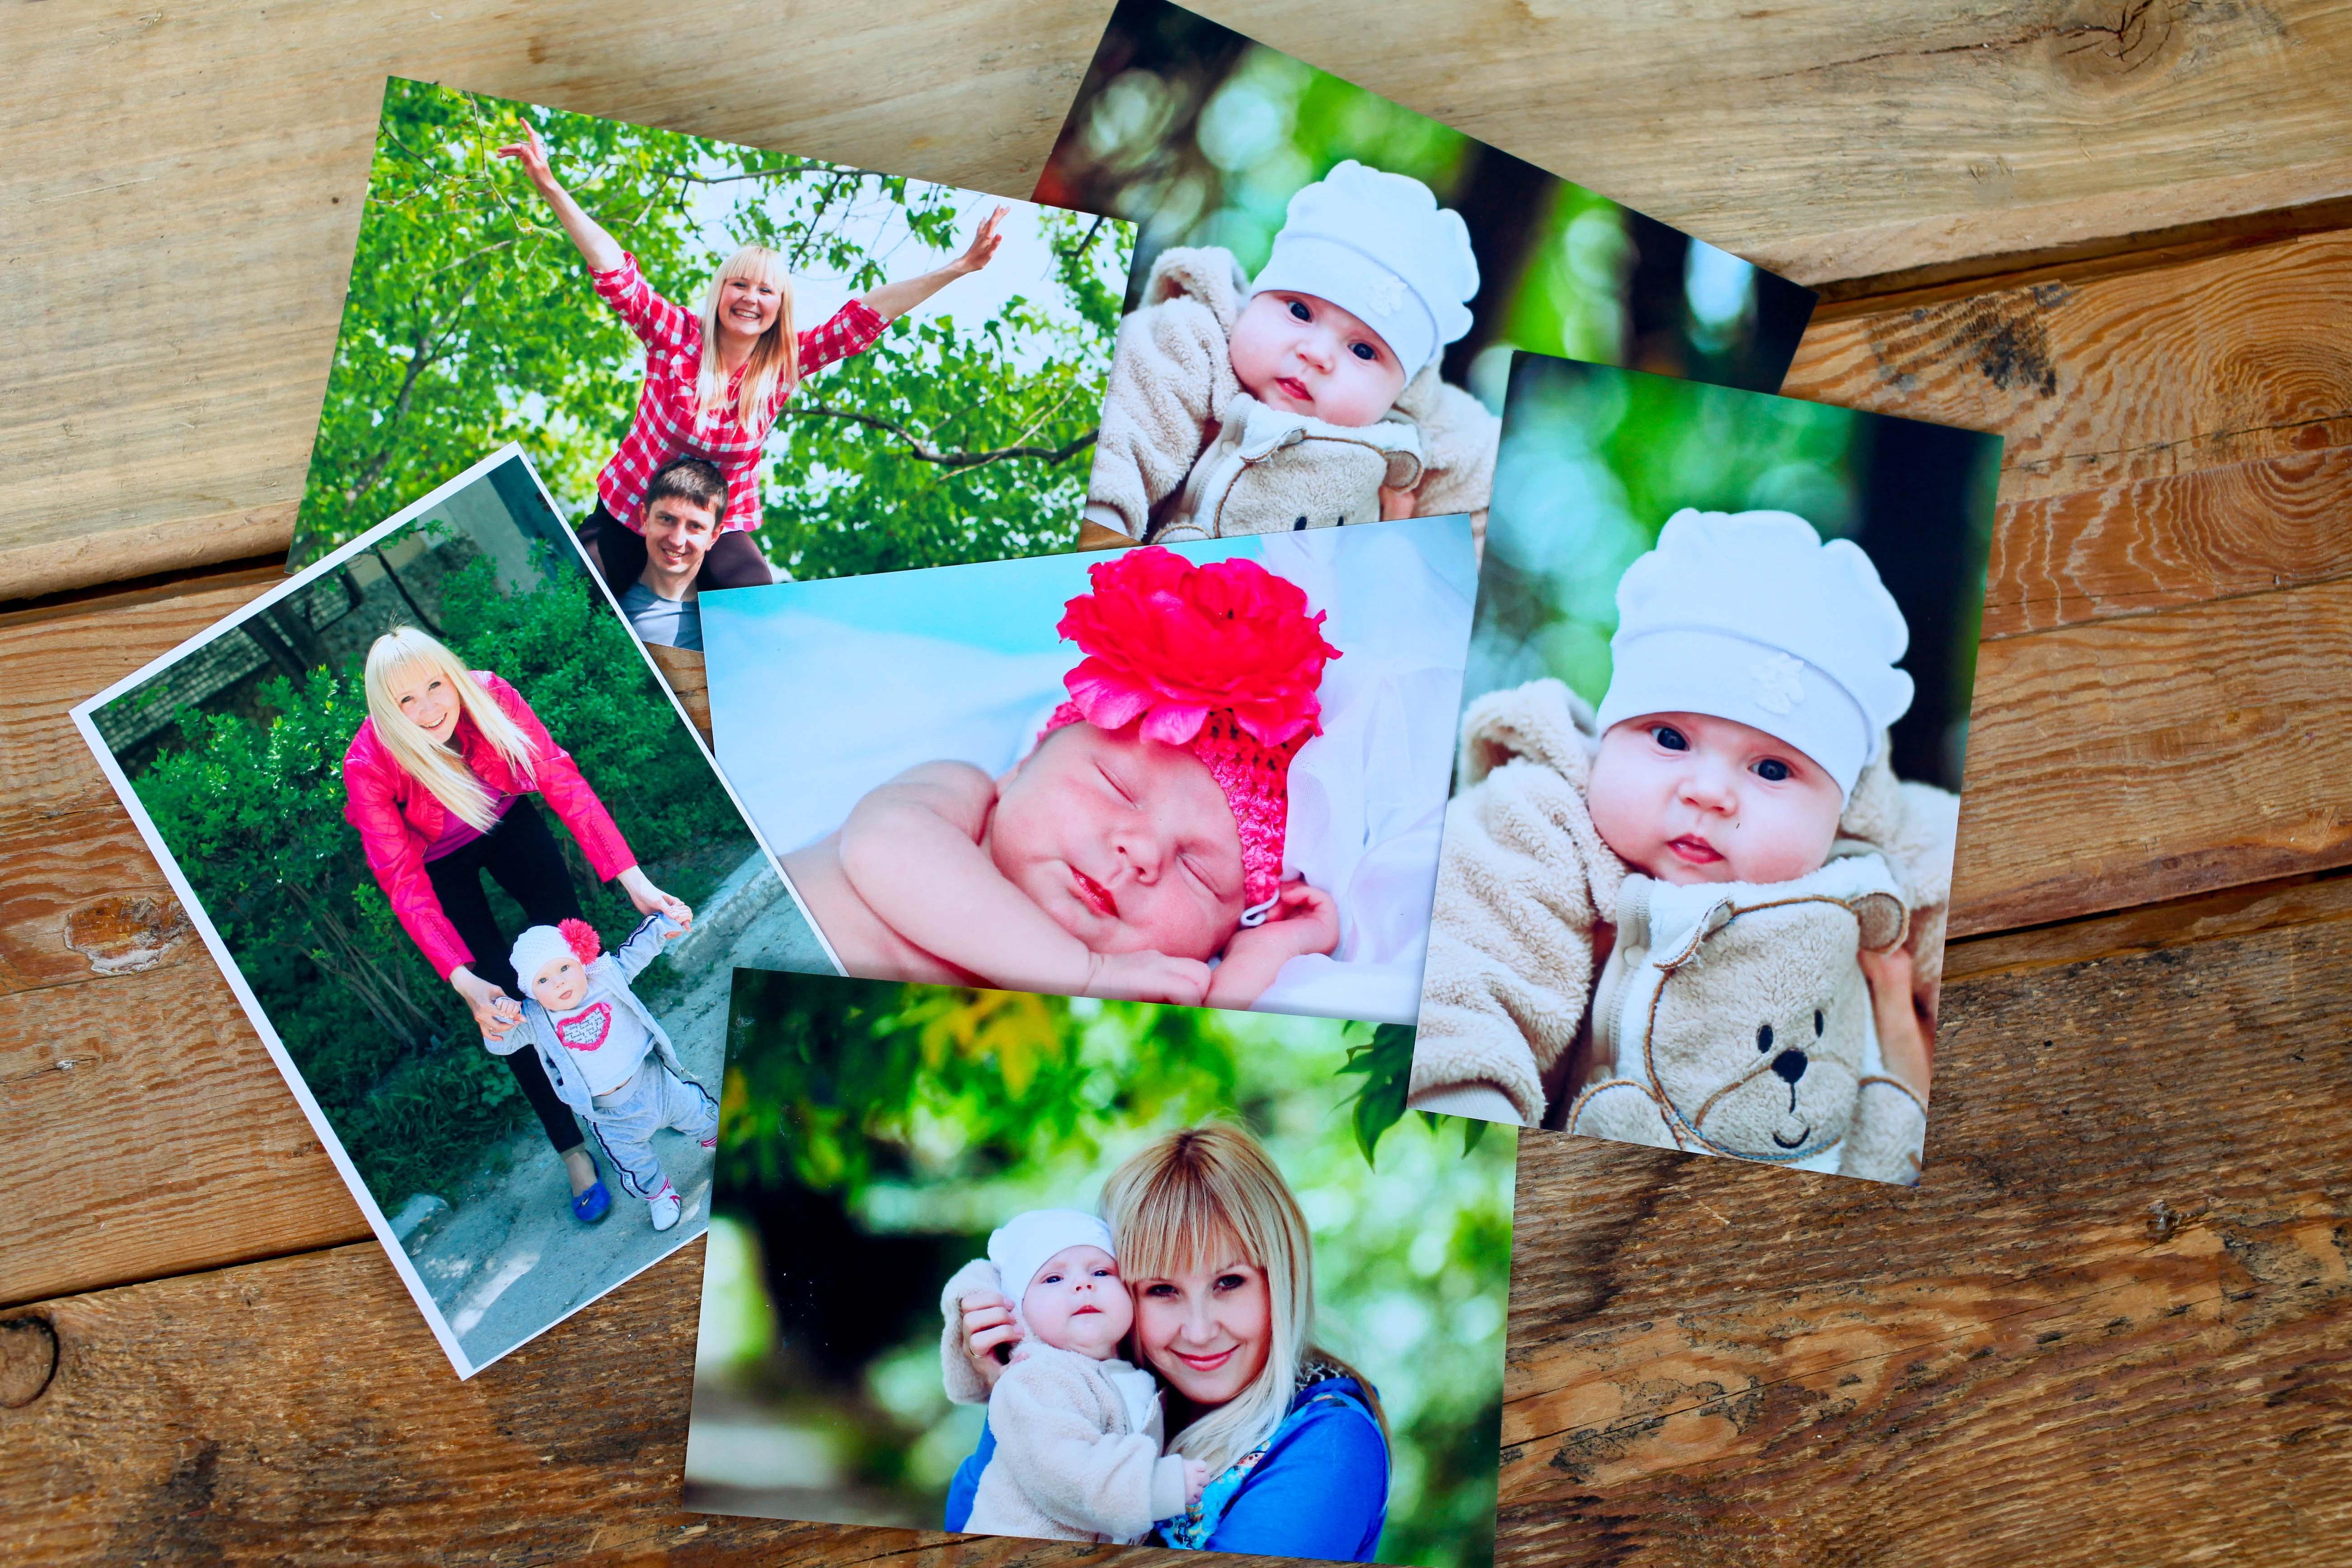 Cvs Photo | Cvs Passport Photo, Photo Prints And One Hour Photo in Cvs Desk Calendar